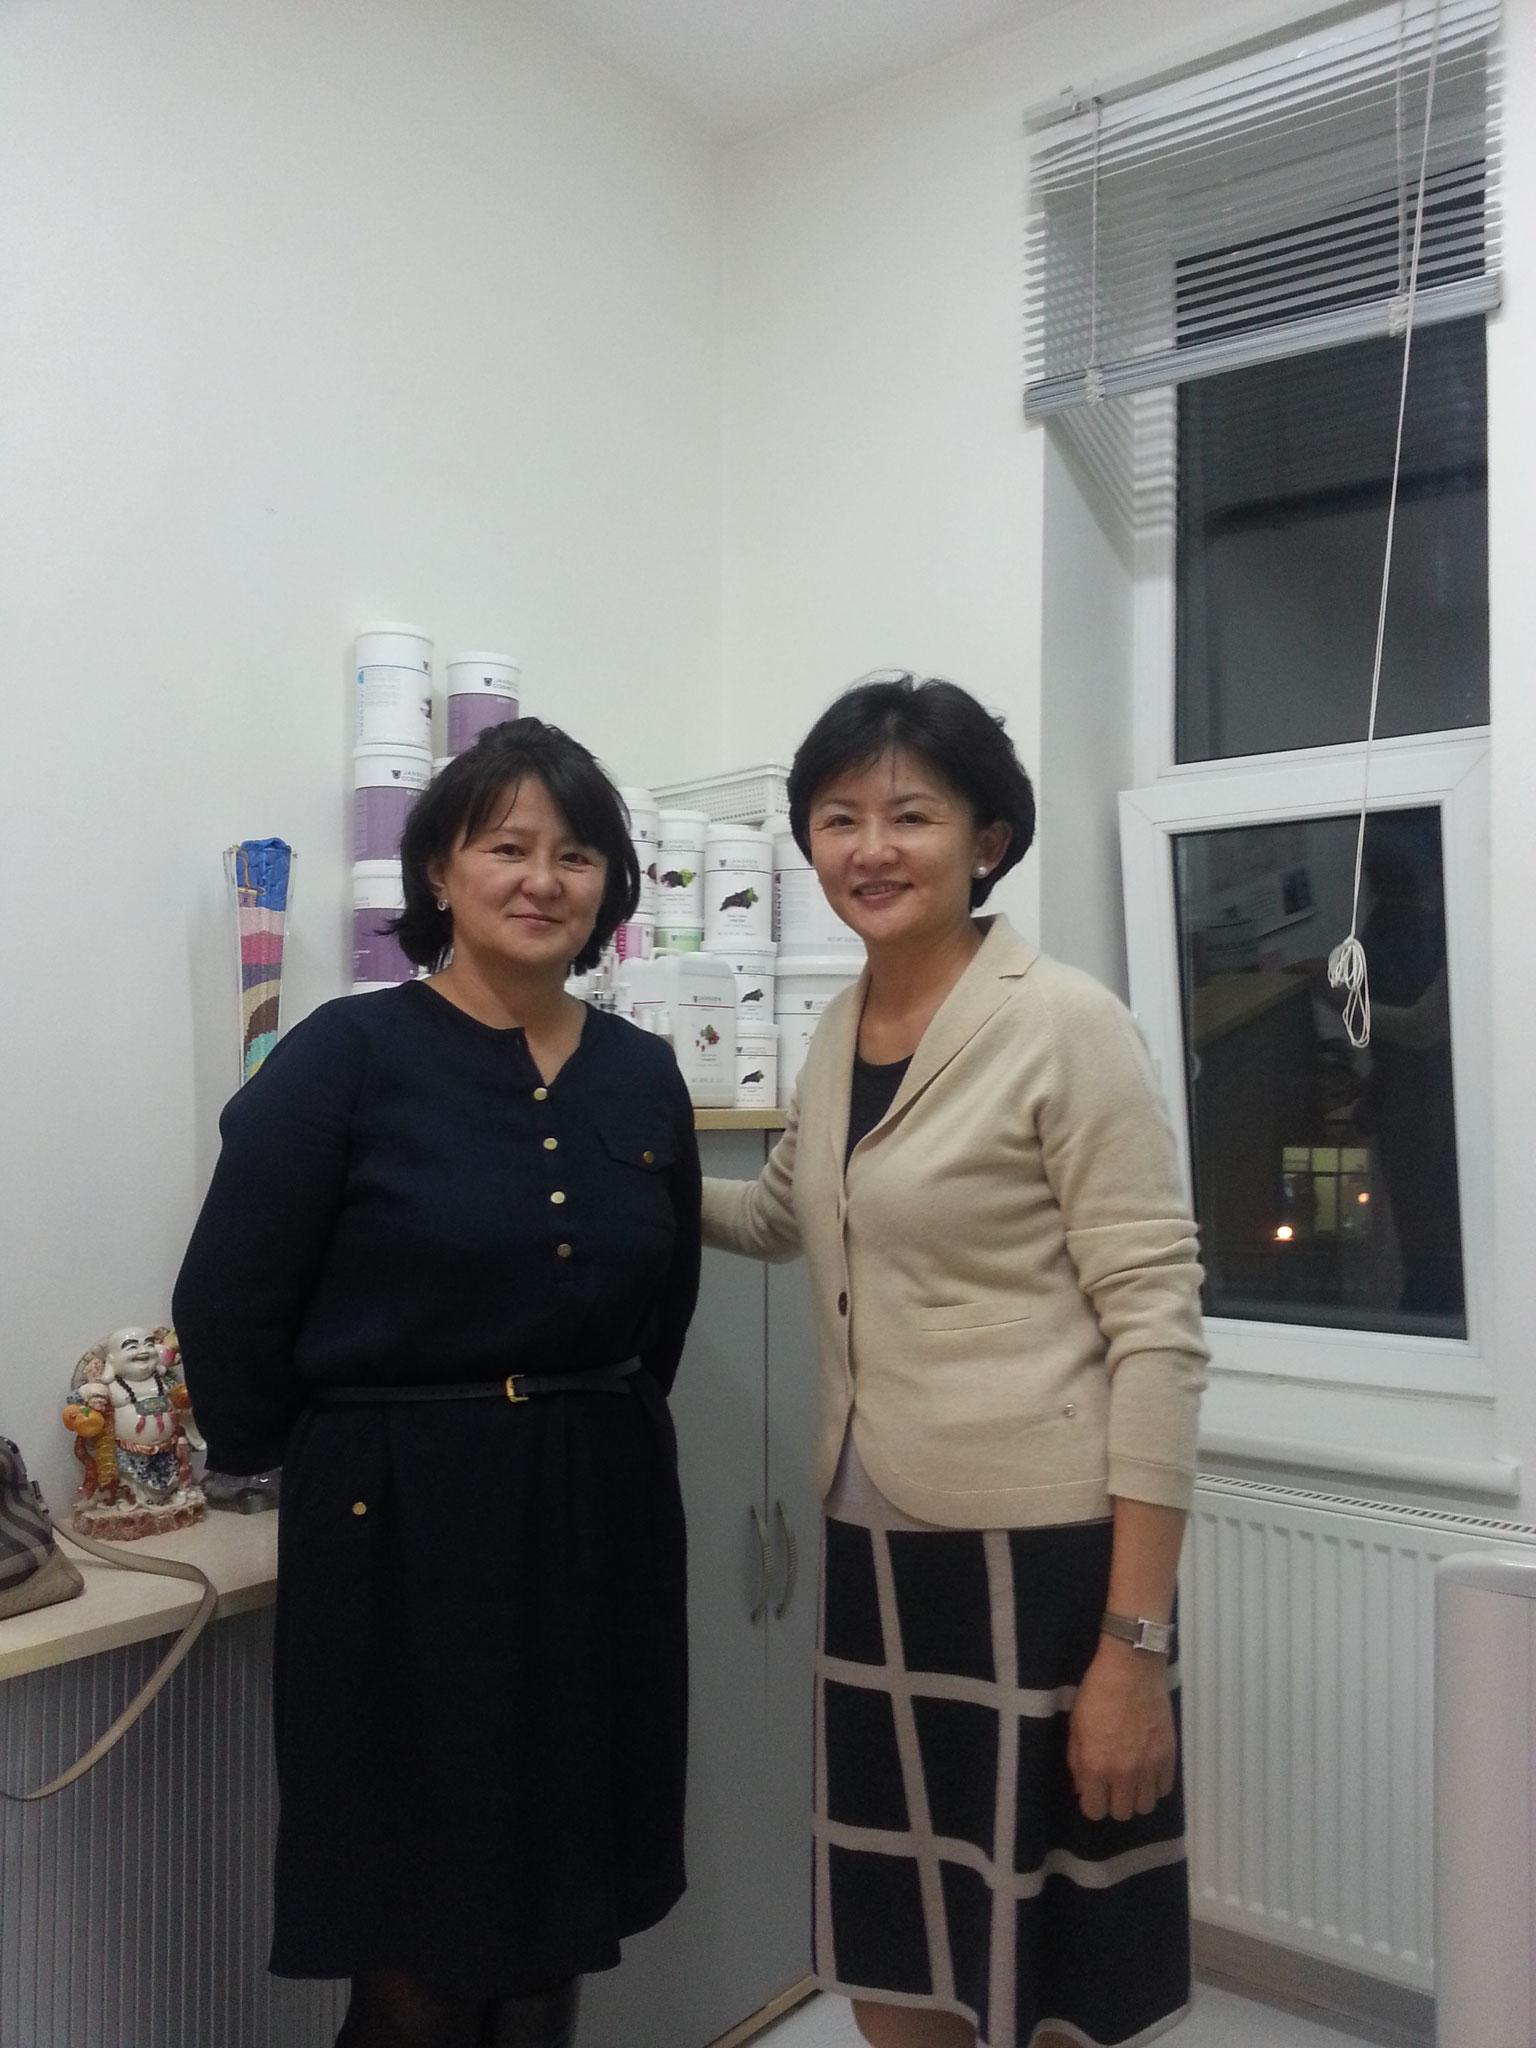 Mrs Munkhsurens and sister